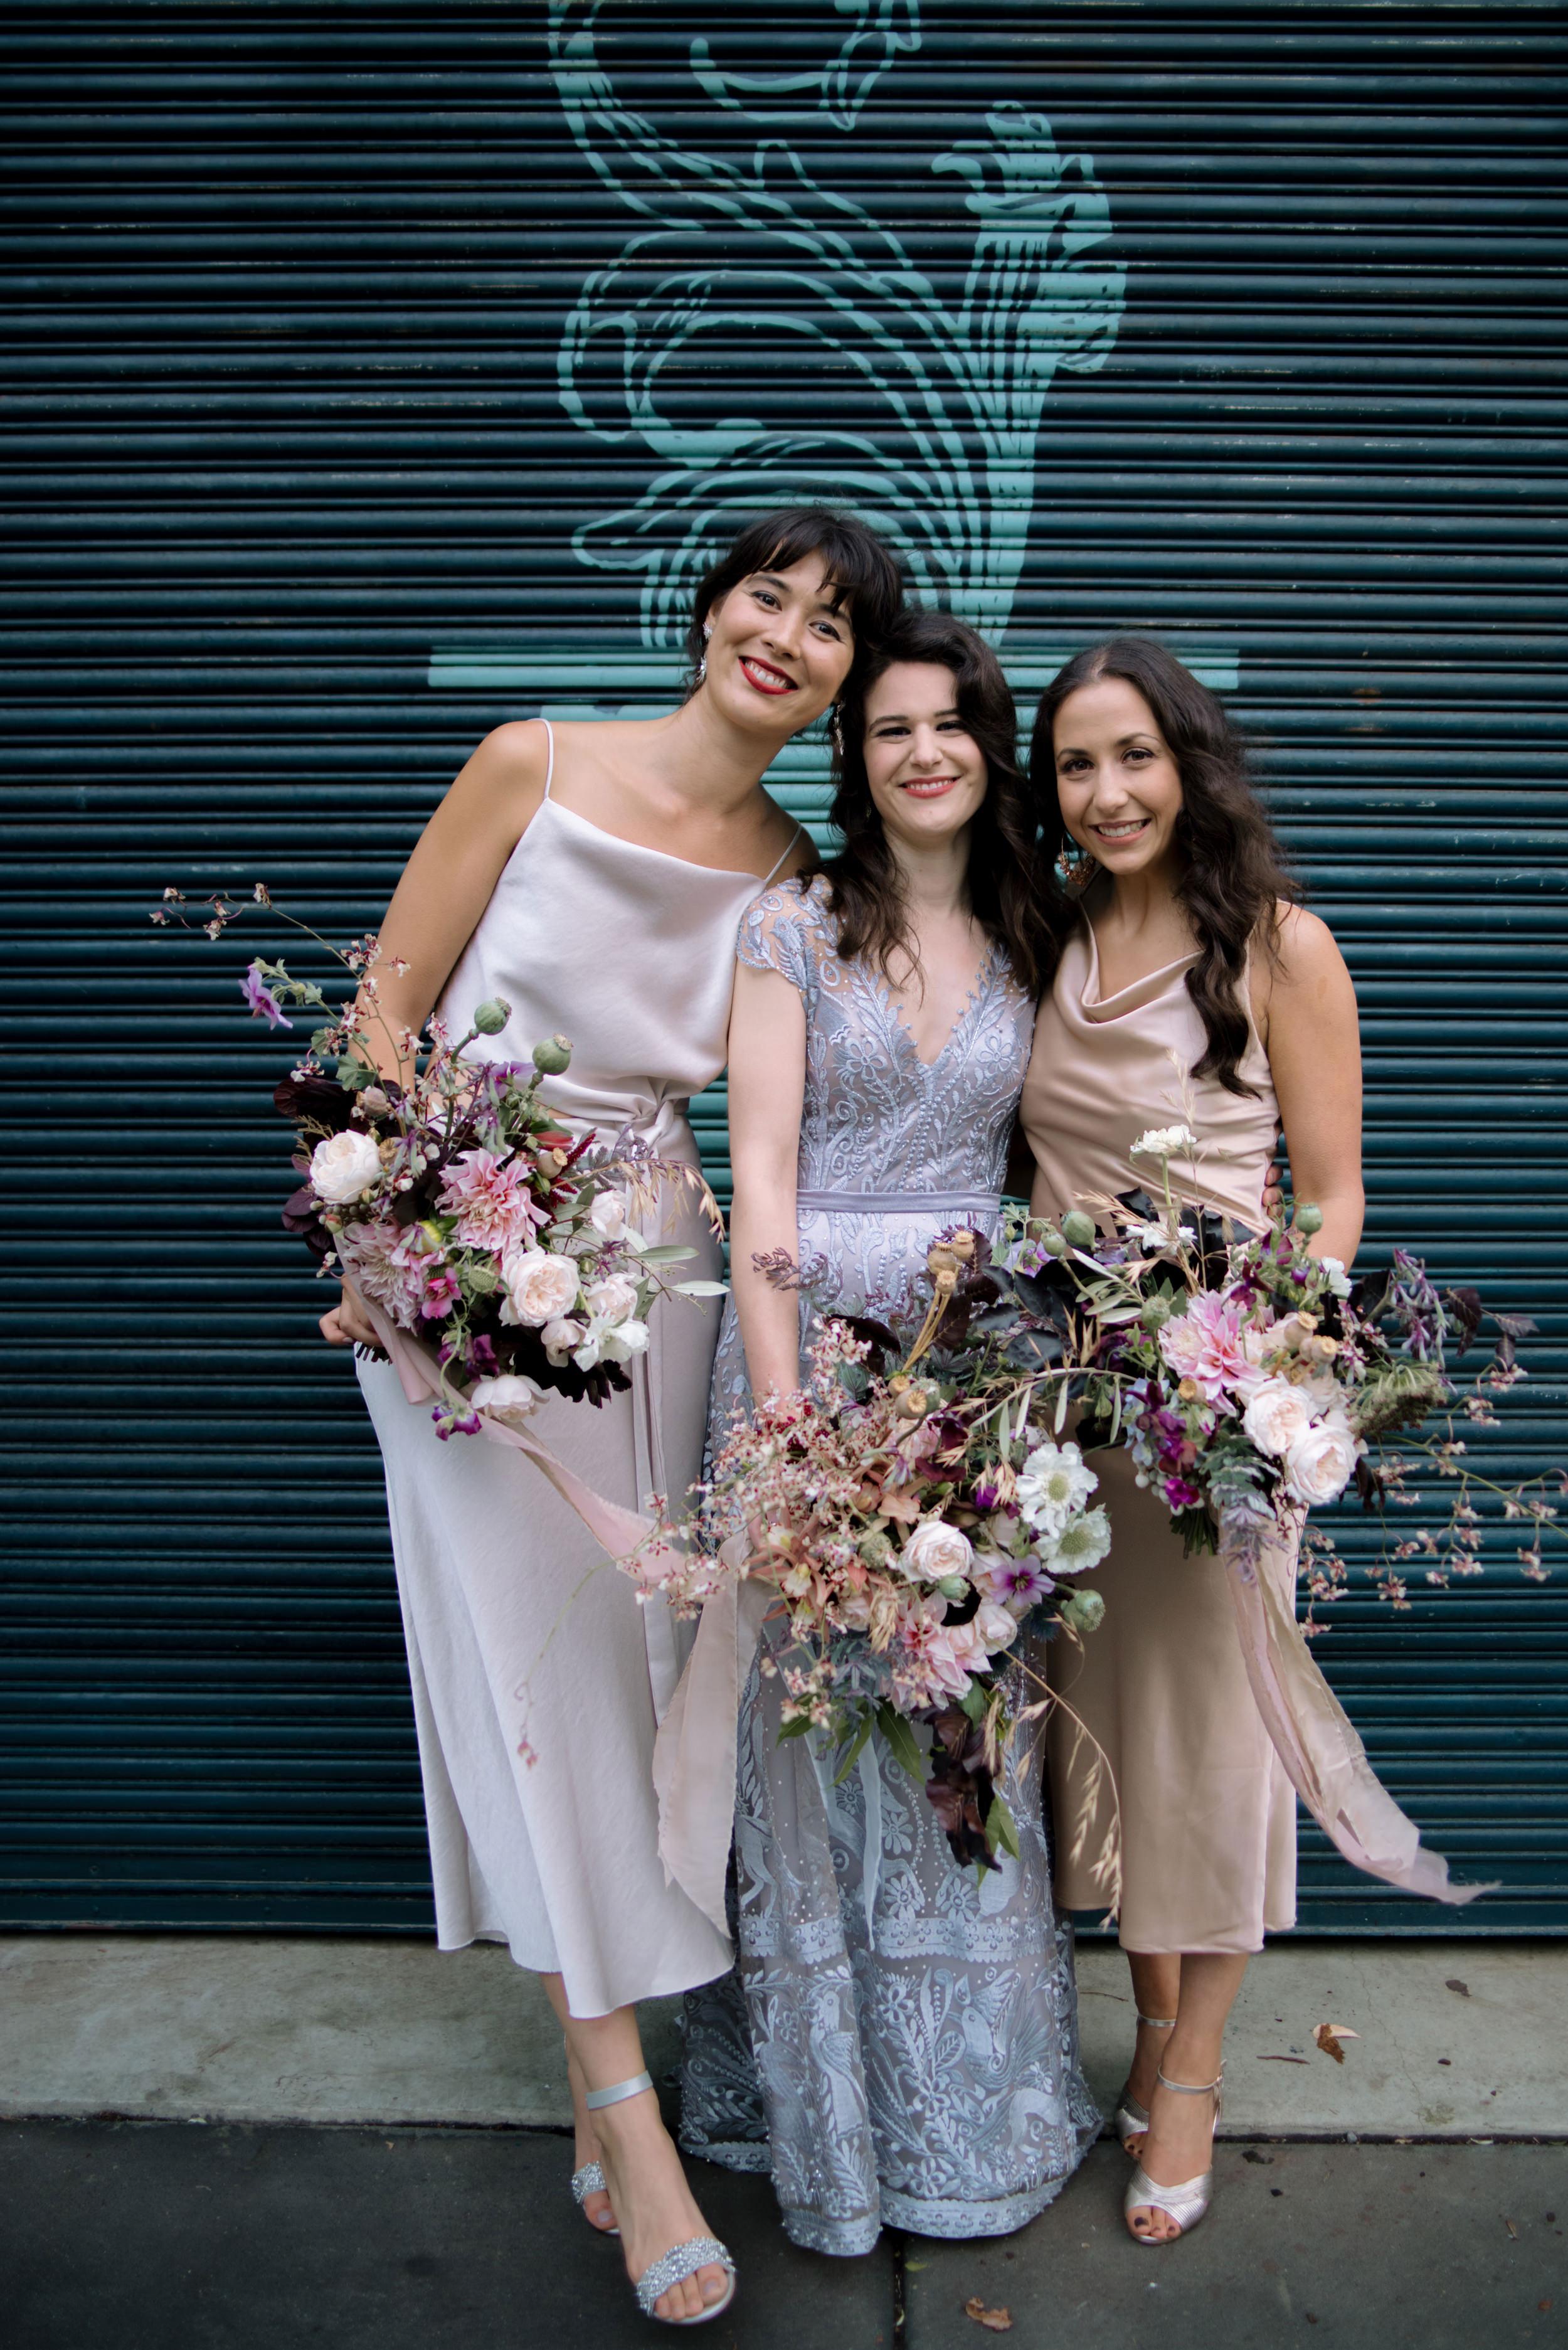 I-Got-You-Babe-&.Co.-Glasshaus-Wedding-Charlotte-Cameron0090.JPG